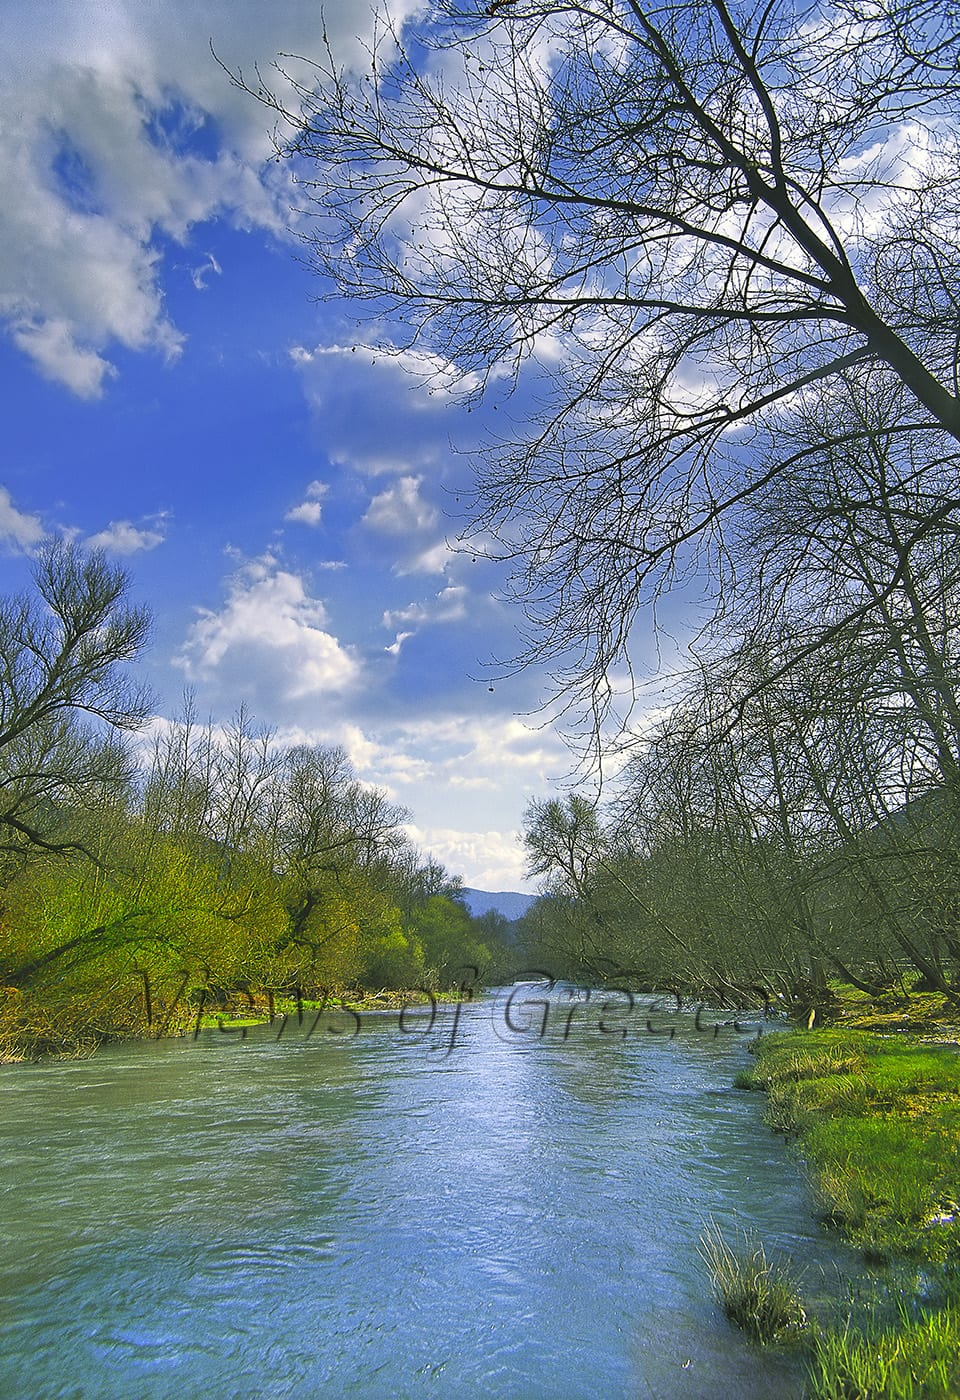 river, outdoor, lake, mountain, greece, ladonas, peloponnese, arcadia, ποταμός Λάδωνας, φράγμα, Δάφνη, Δήμητρα, Κοντοβάζαινα, διαδρομές, αποδράσεις, Κυράς Γεφύρι, Αφροδίσιο Όρος, ιερό Αφροδίτης, πηγές Λάδωνα, rafting